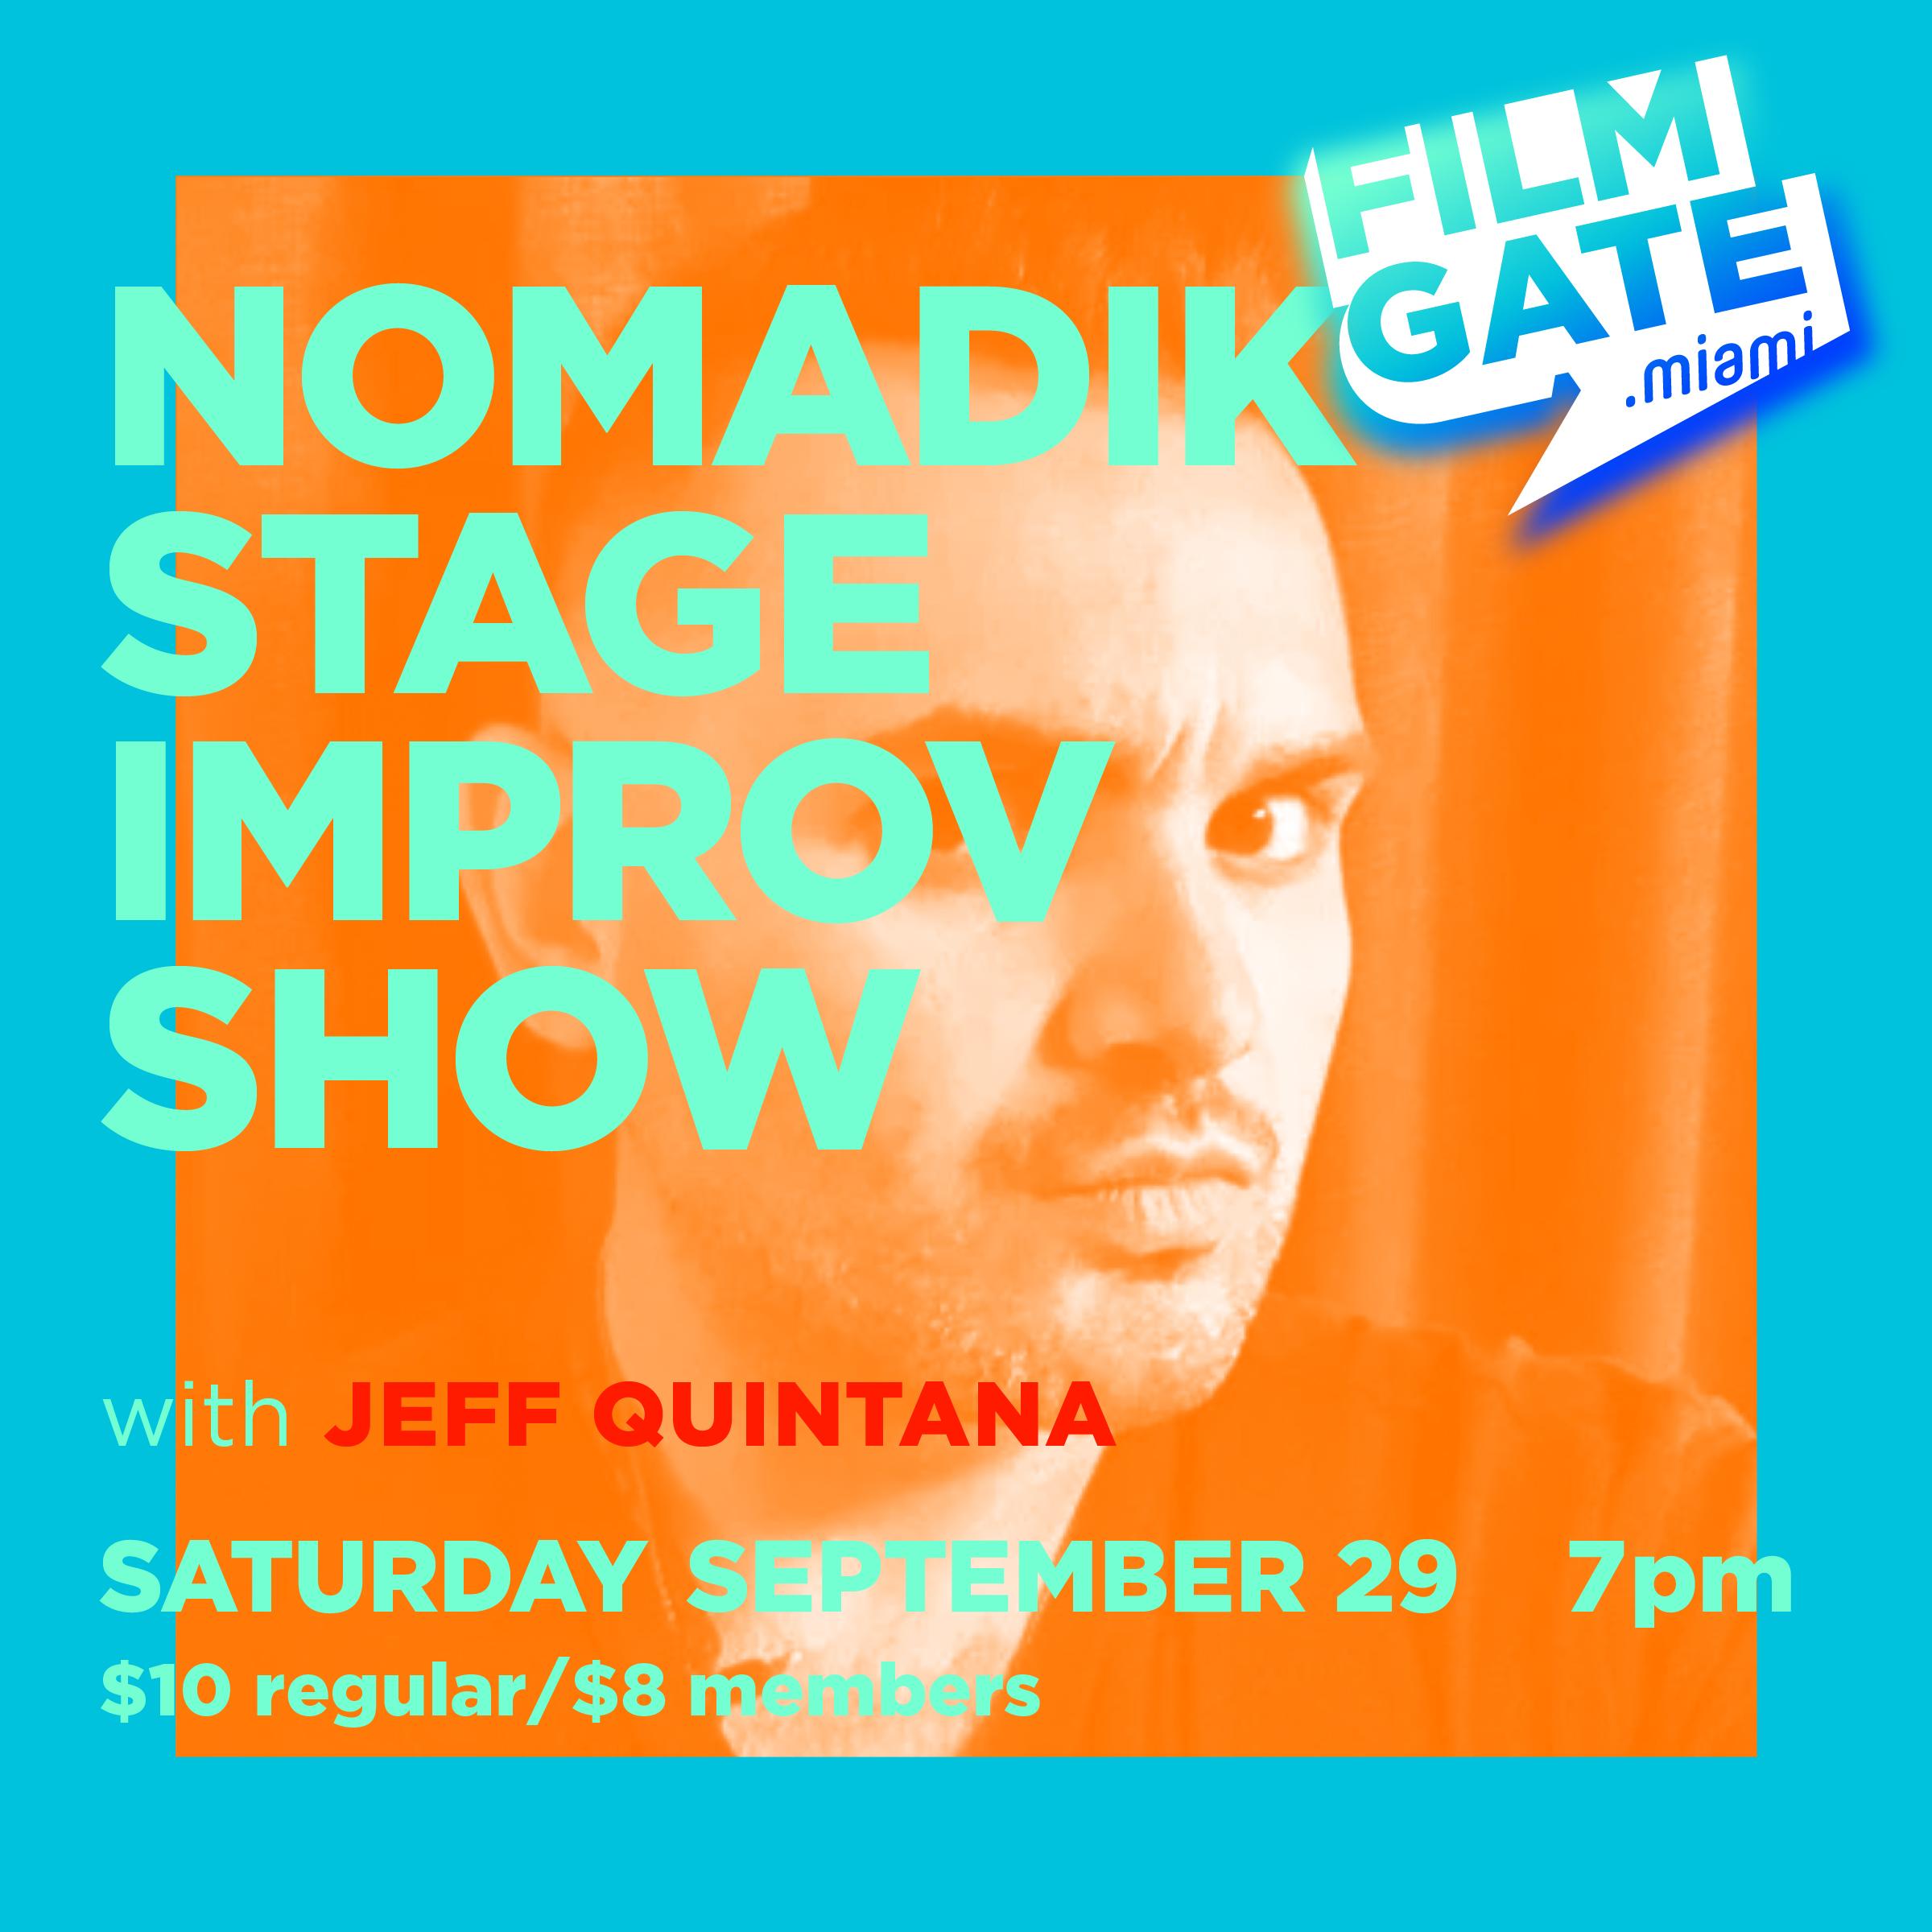 FG_NomadikStage.jpg